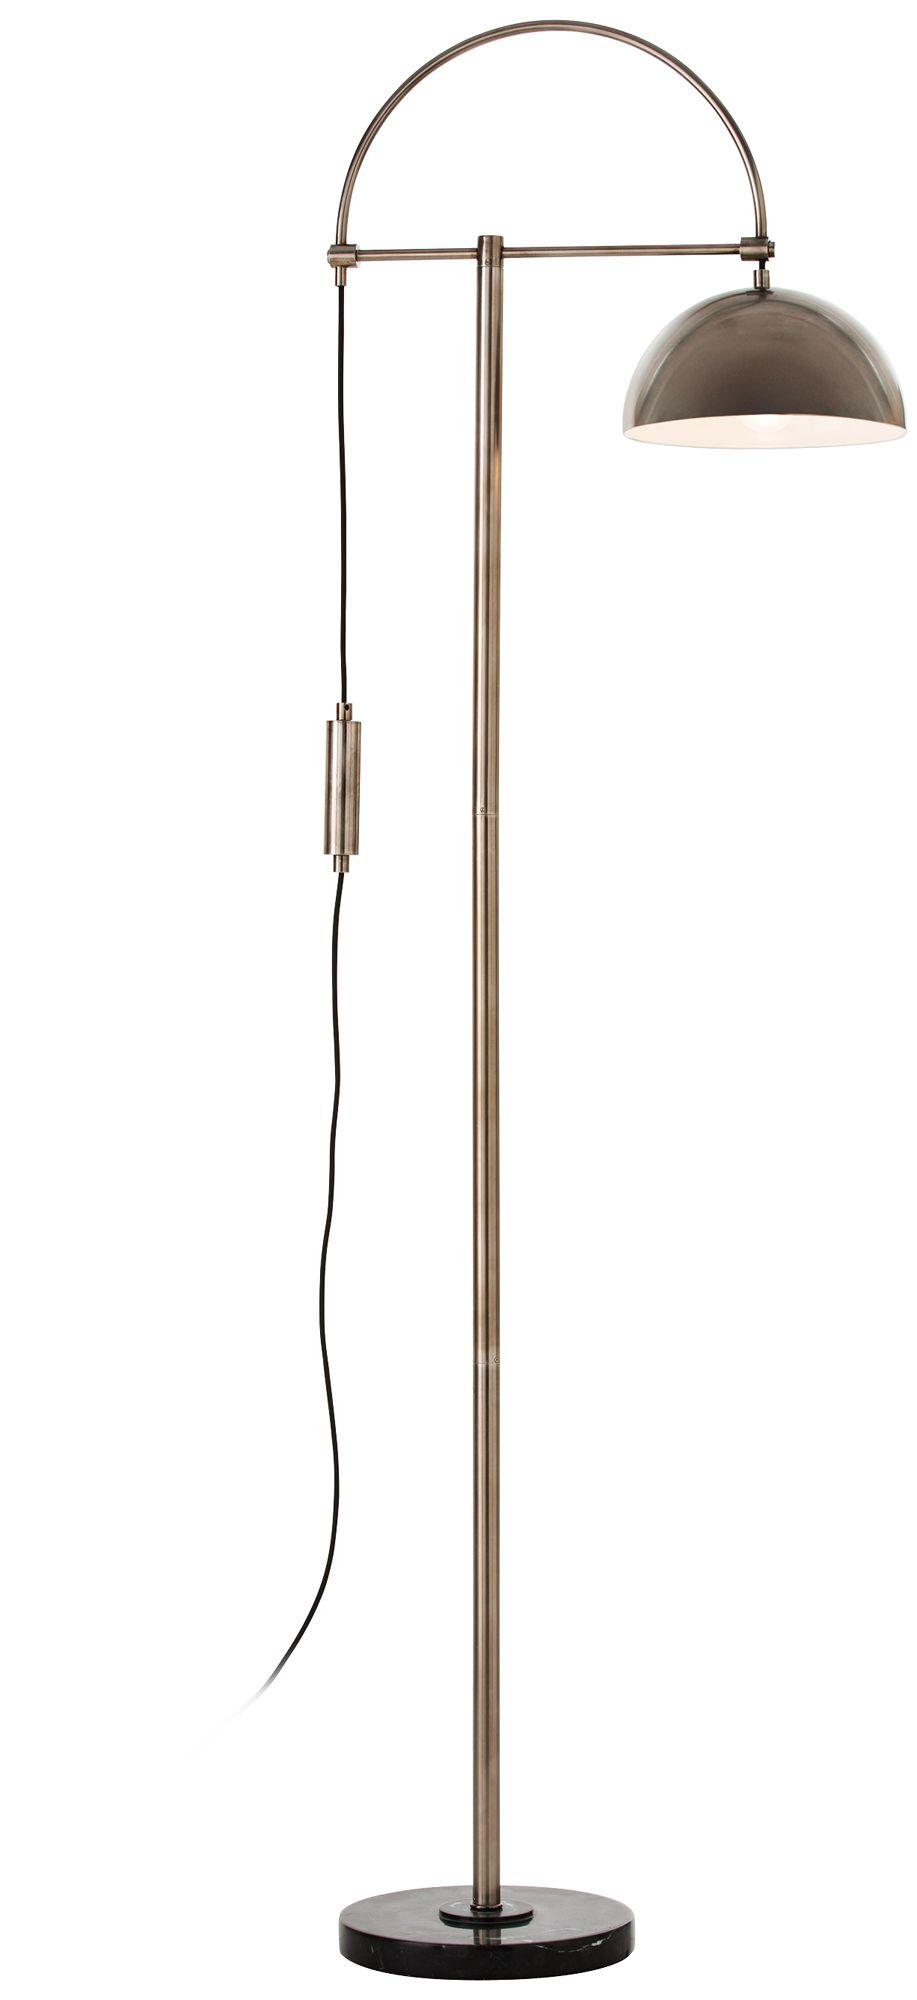 arteriors home jillian vintage silver floor lamp - Silver Floor Lamp